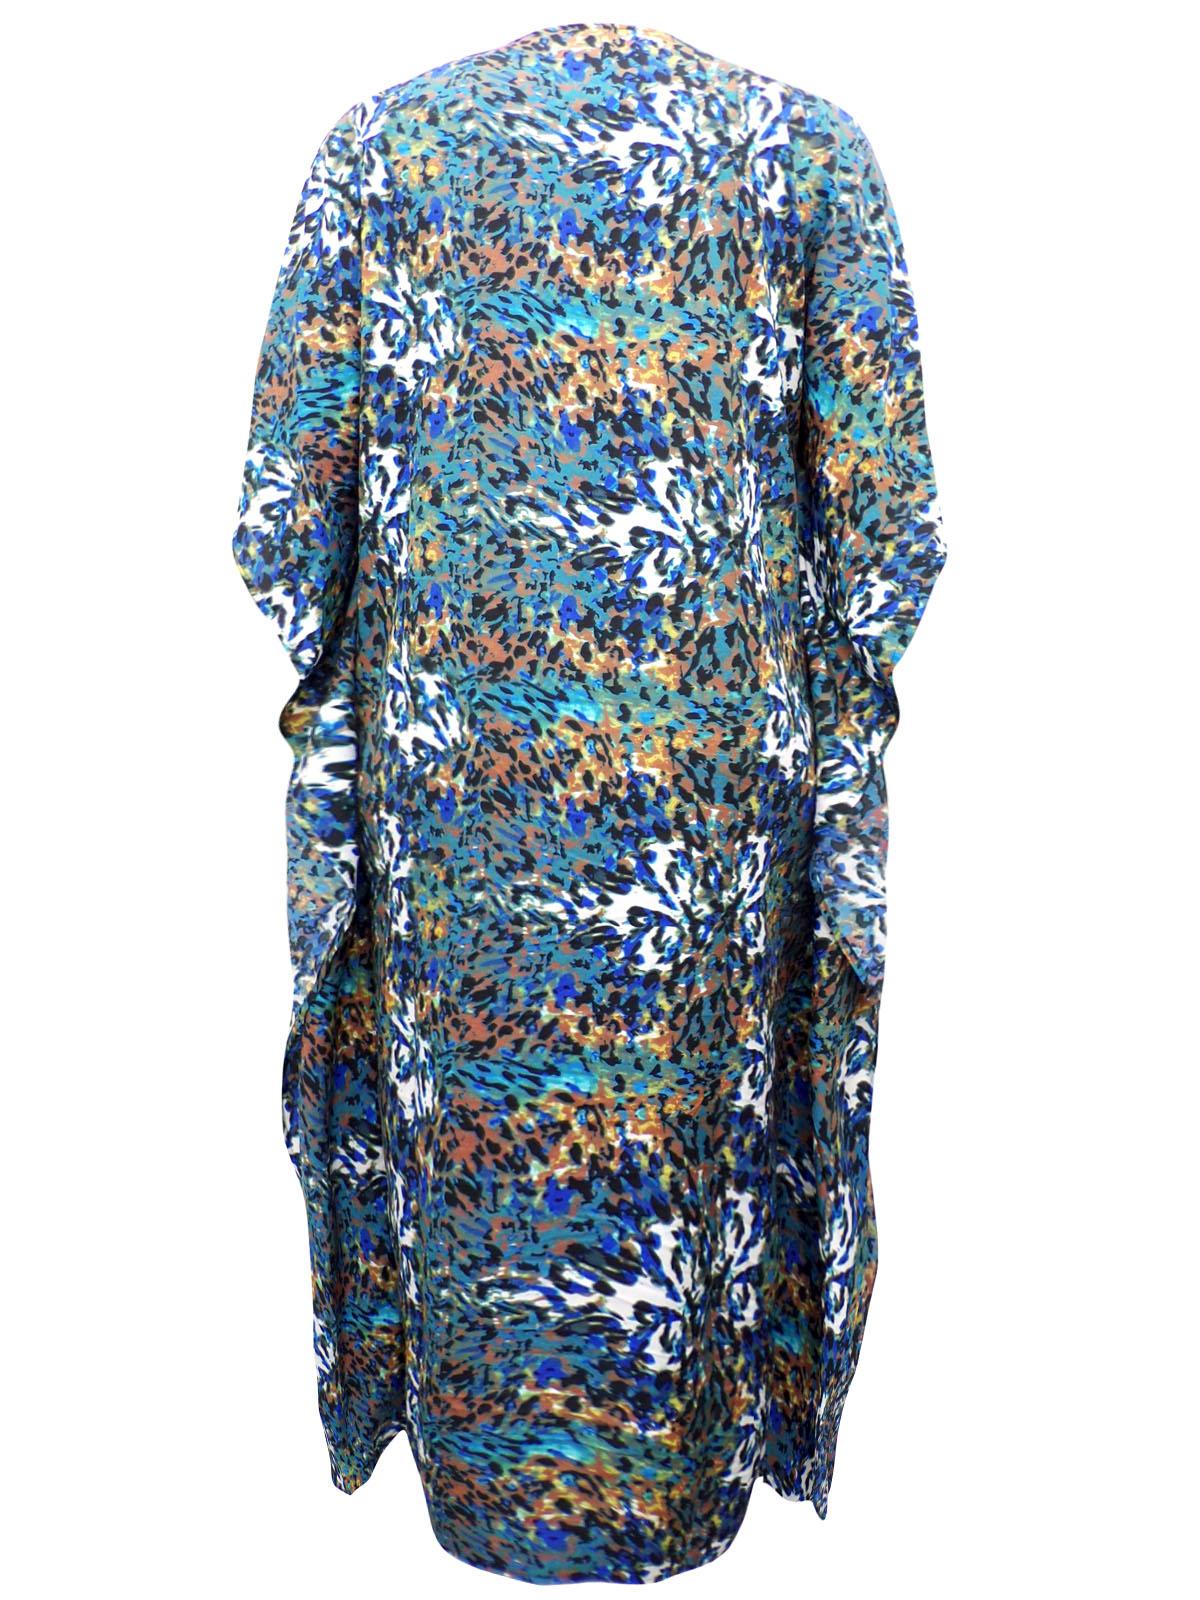 eaonplus COLOURED So So Soft Animal Print Kaftan Dress  PLUS SIZE 14 to 34